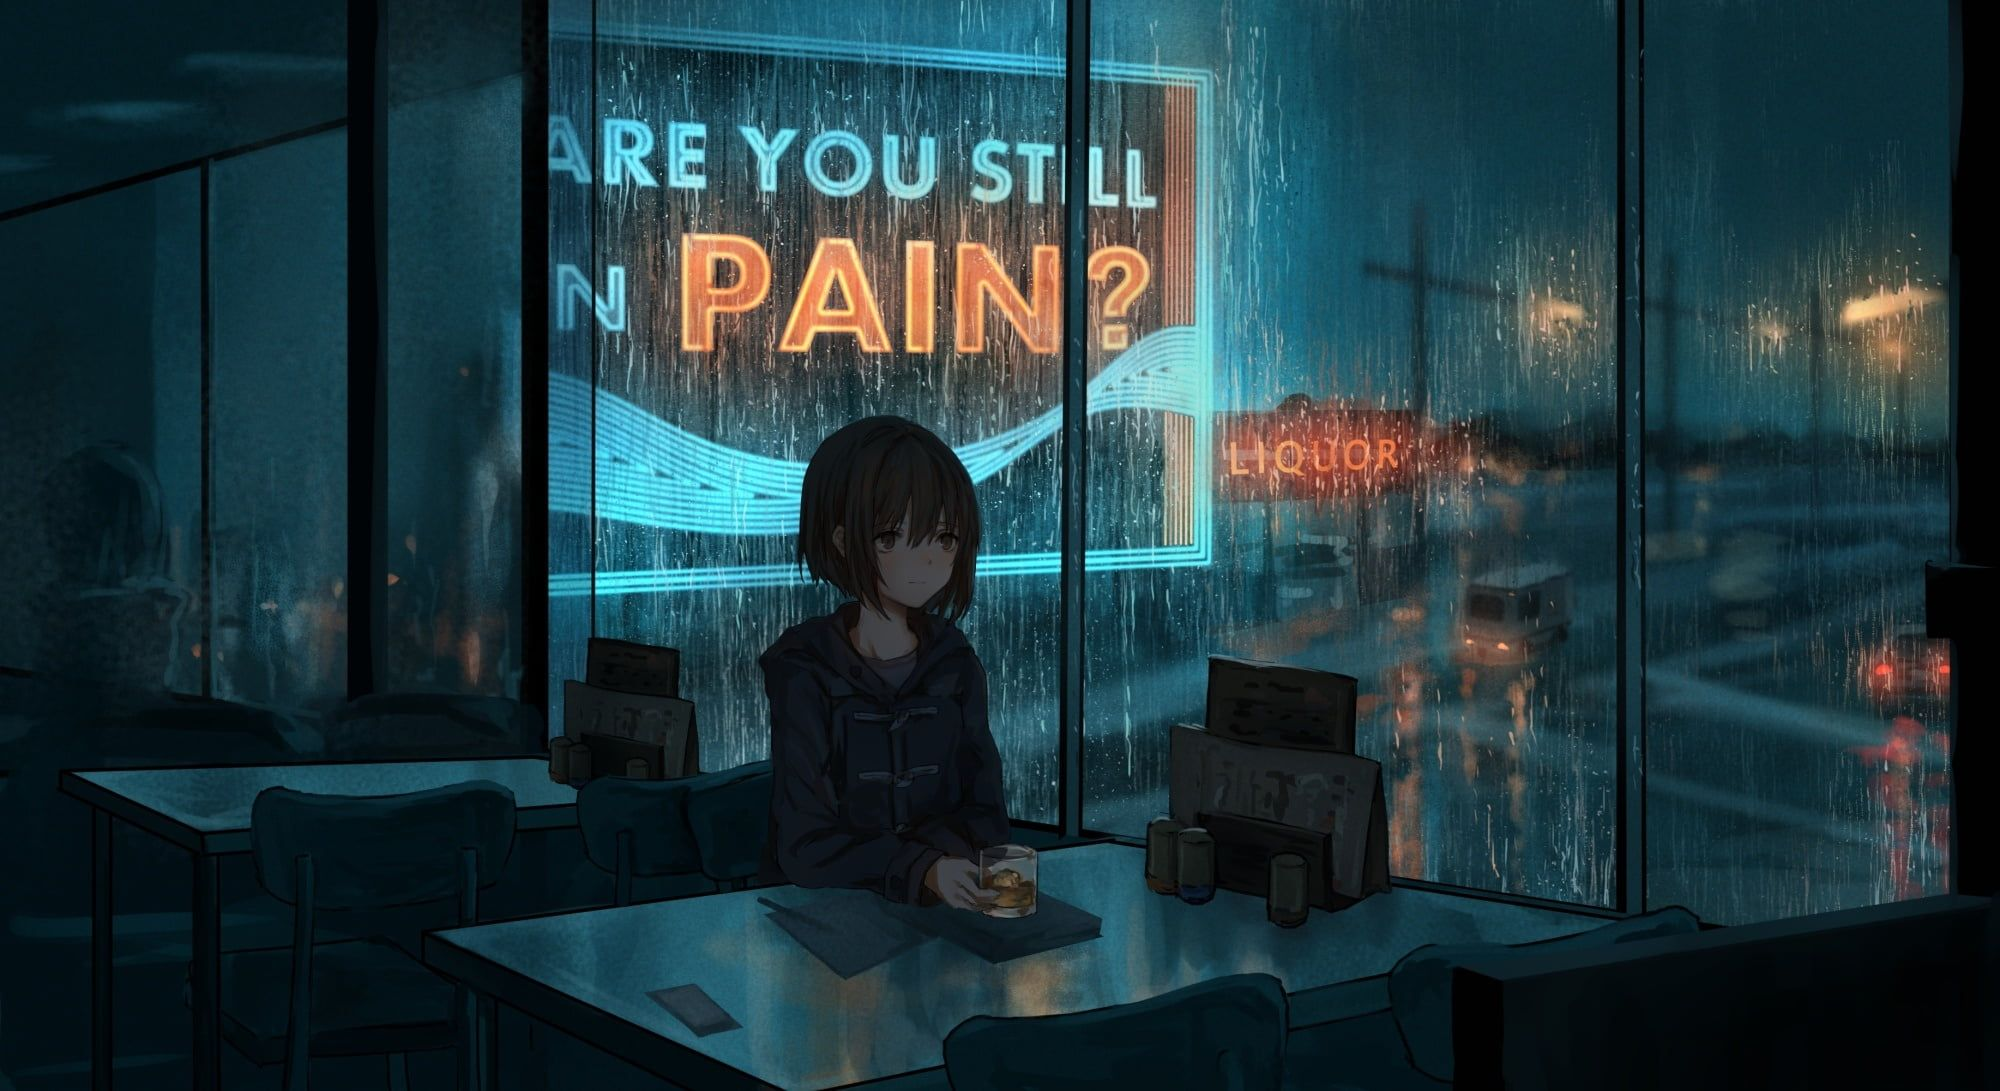 Night Rain Mood Anime Art Cafe 1080p Wallpaper Hdwallpaper Desktop Dark Anime Anime Scenery Wallpaper Anime Scenery